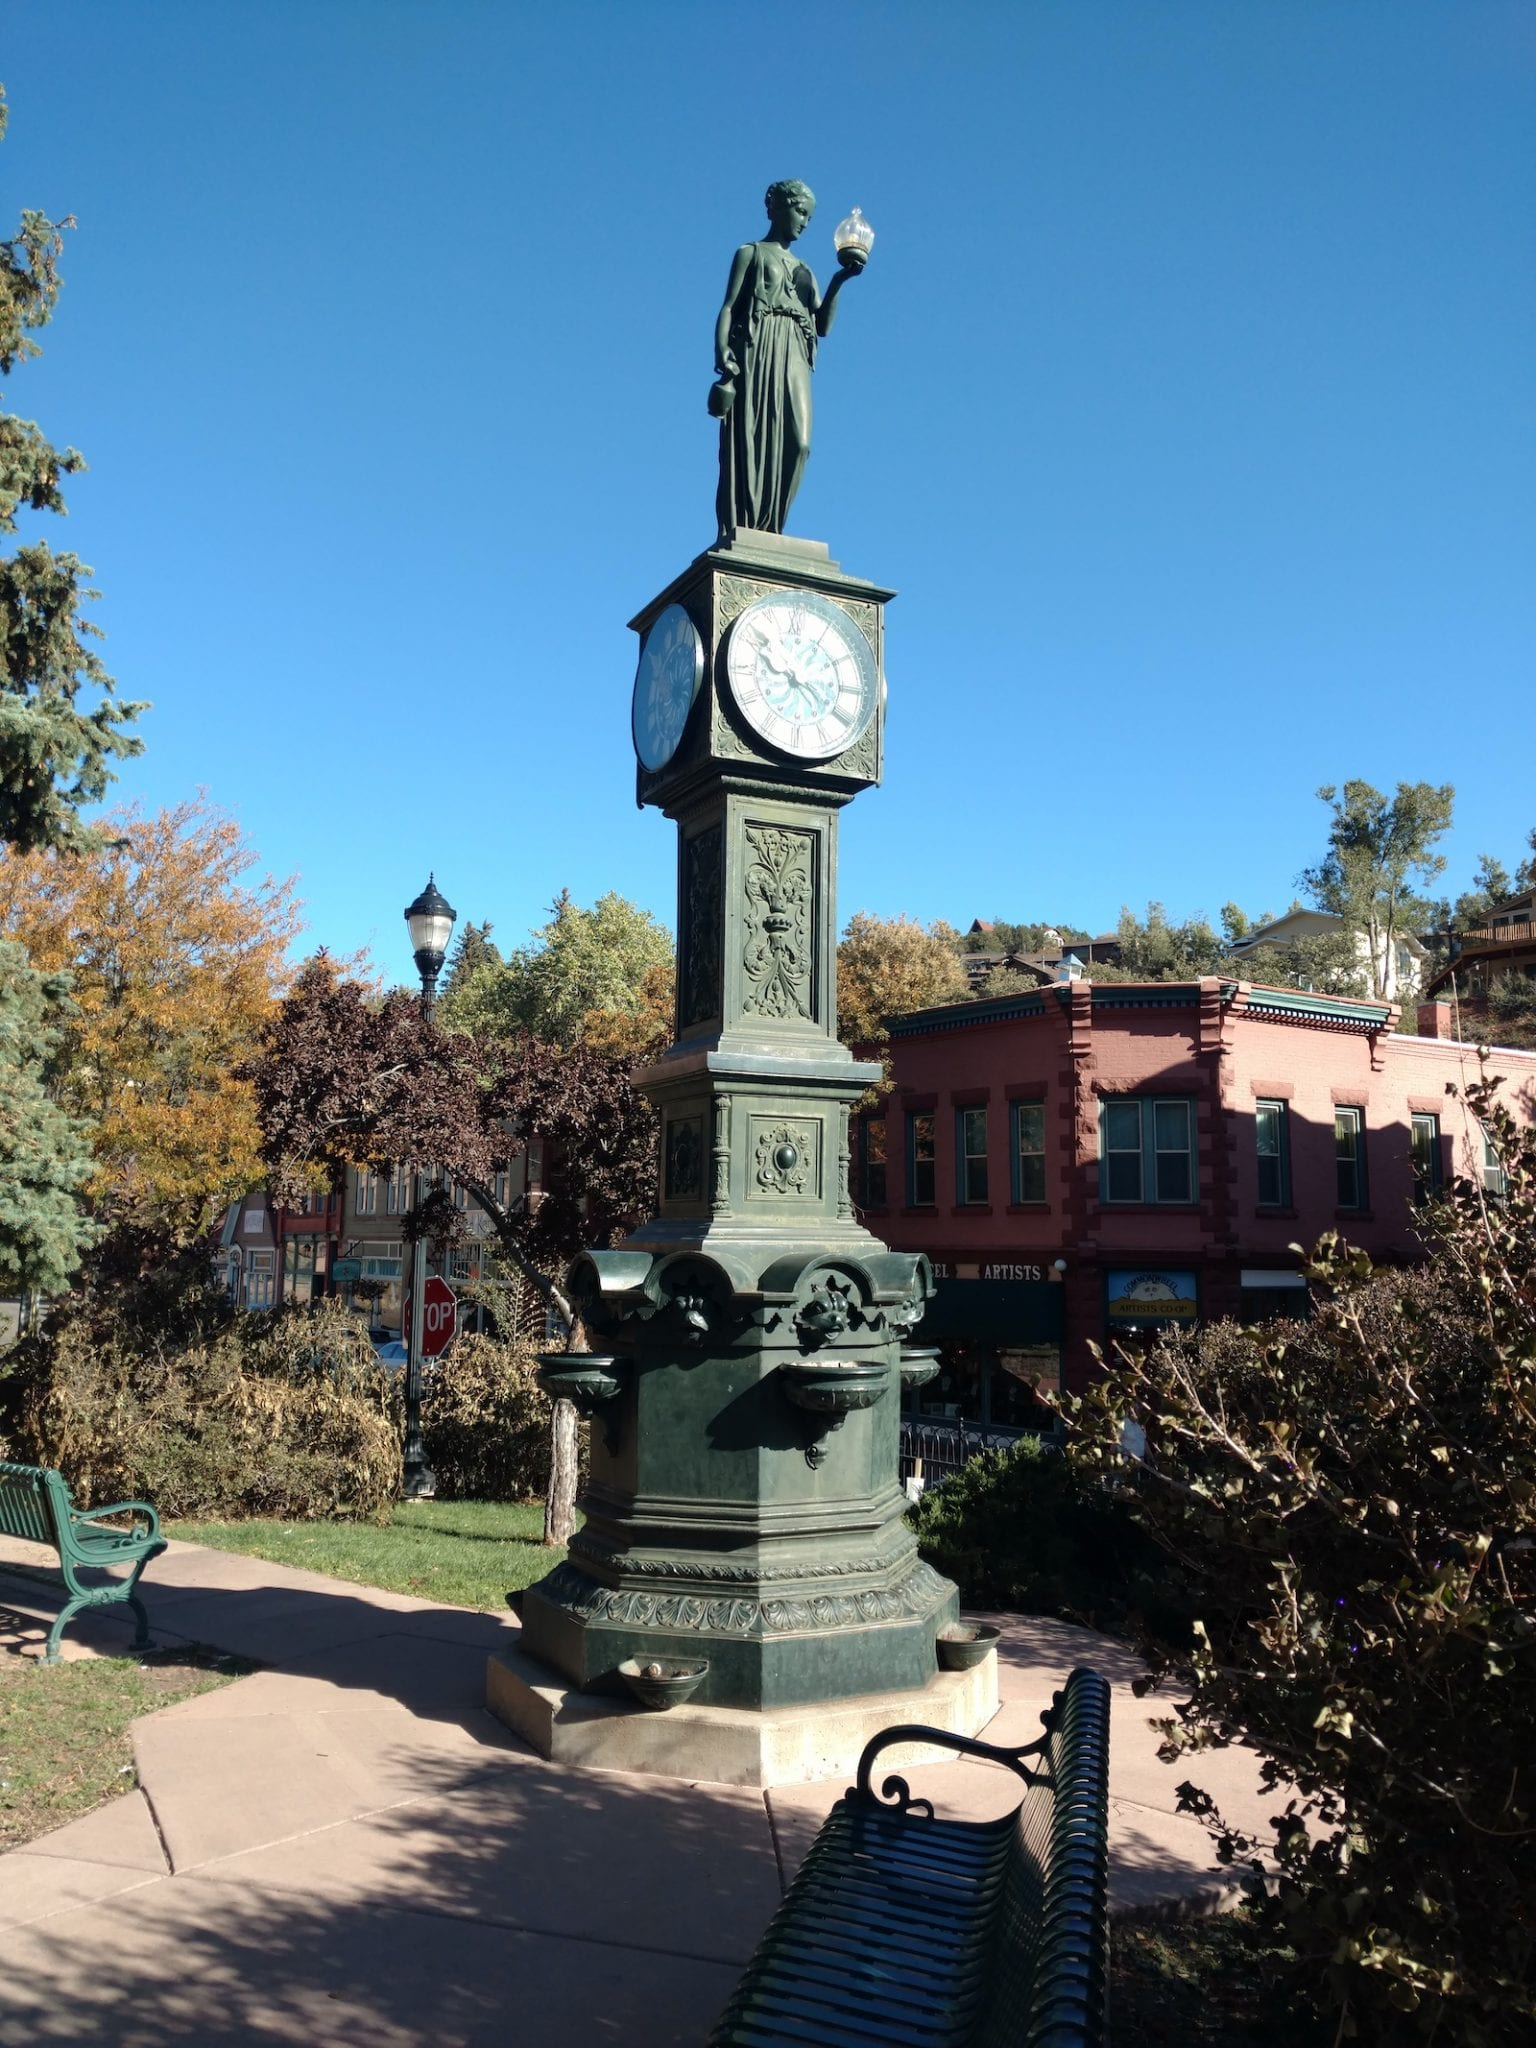 Town Clock With Skeleton in Tree Colorado Springs ArtWalk